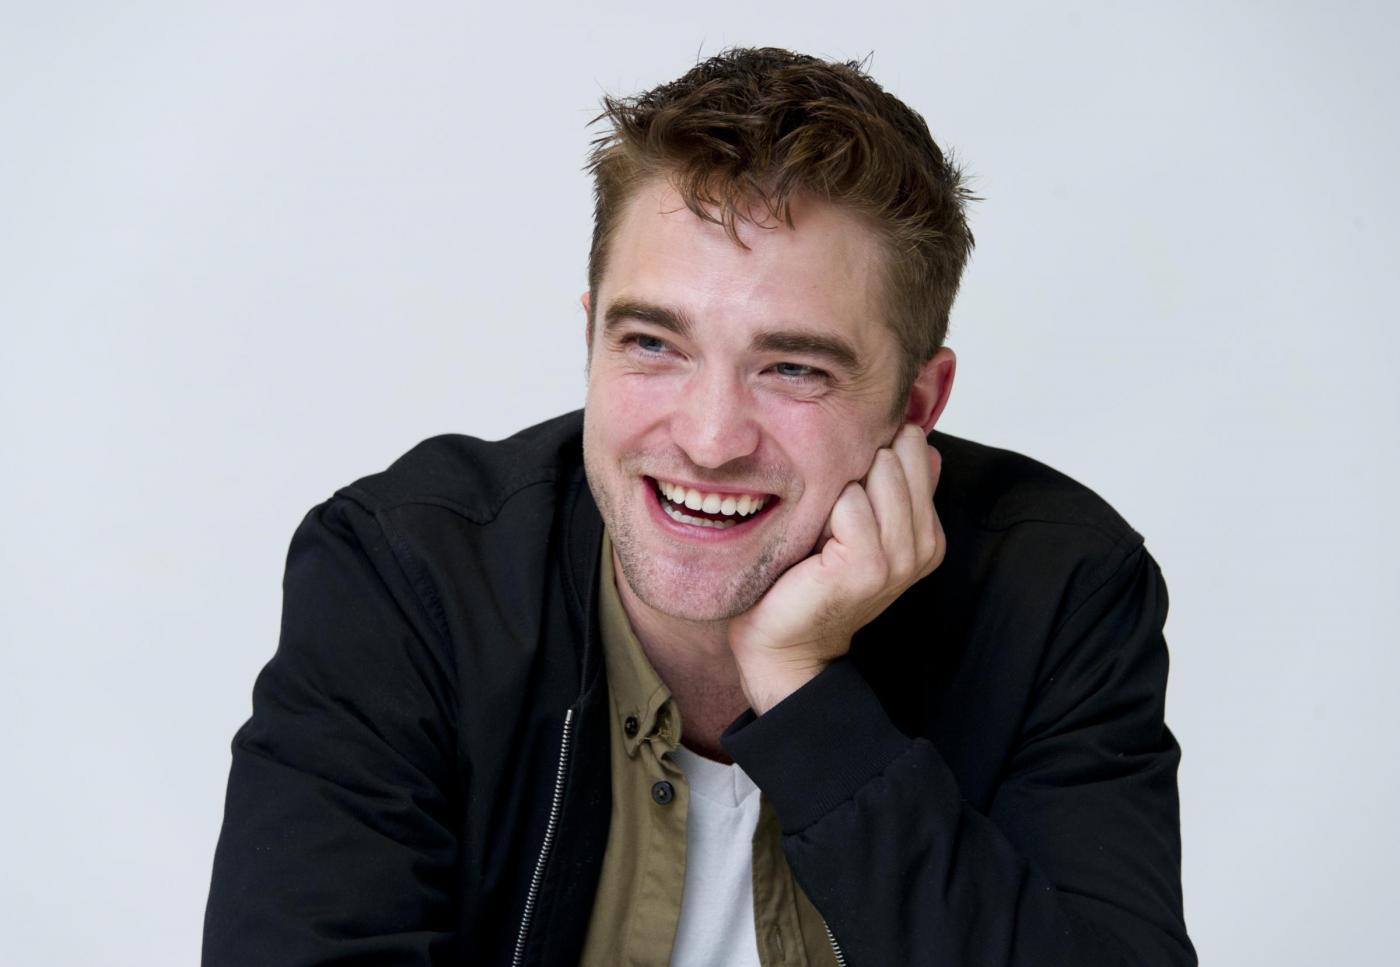 Robert Pattinson ultime news, dopo Kristen Stewart l'attore confessa: 'Sono ansioso'